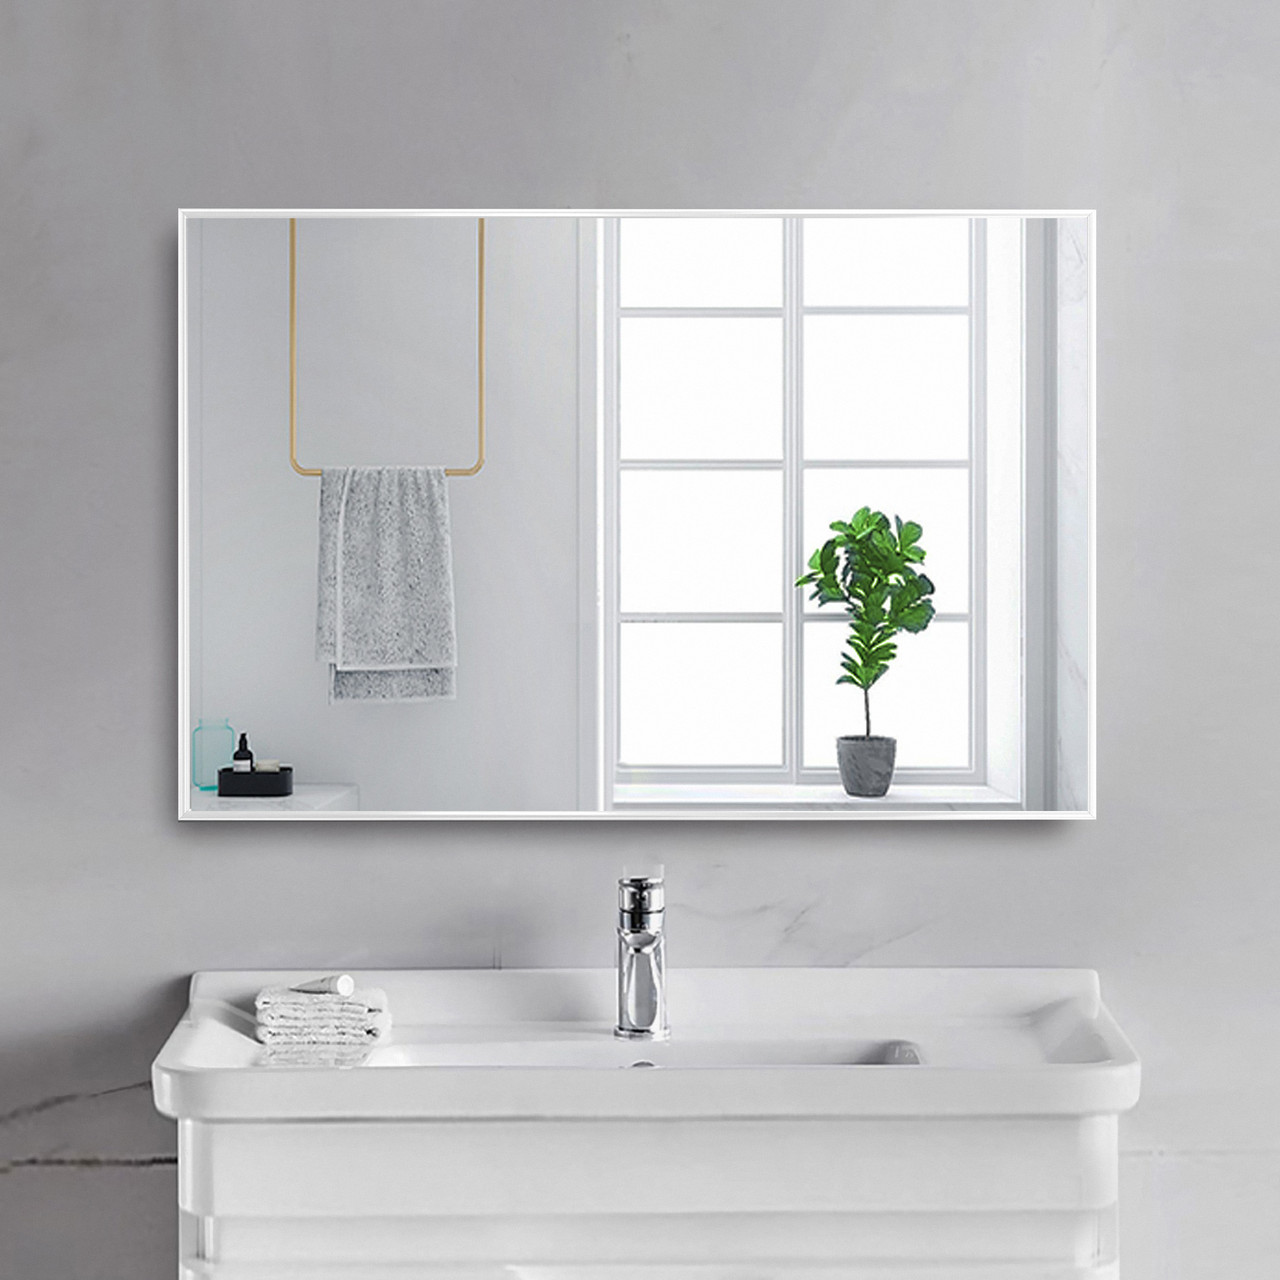 Зеркало в раме 400х600 мм белого цвета пр. Украина